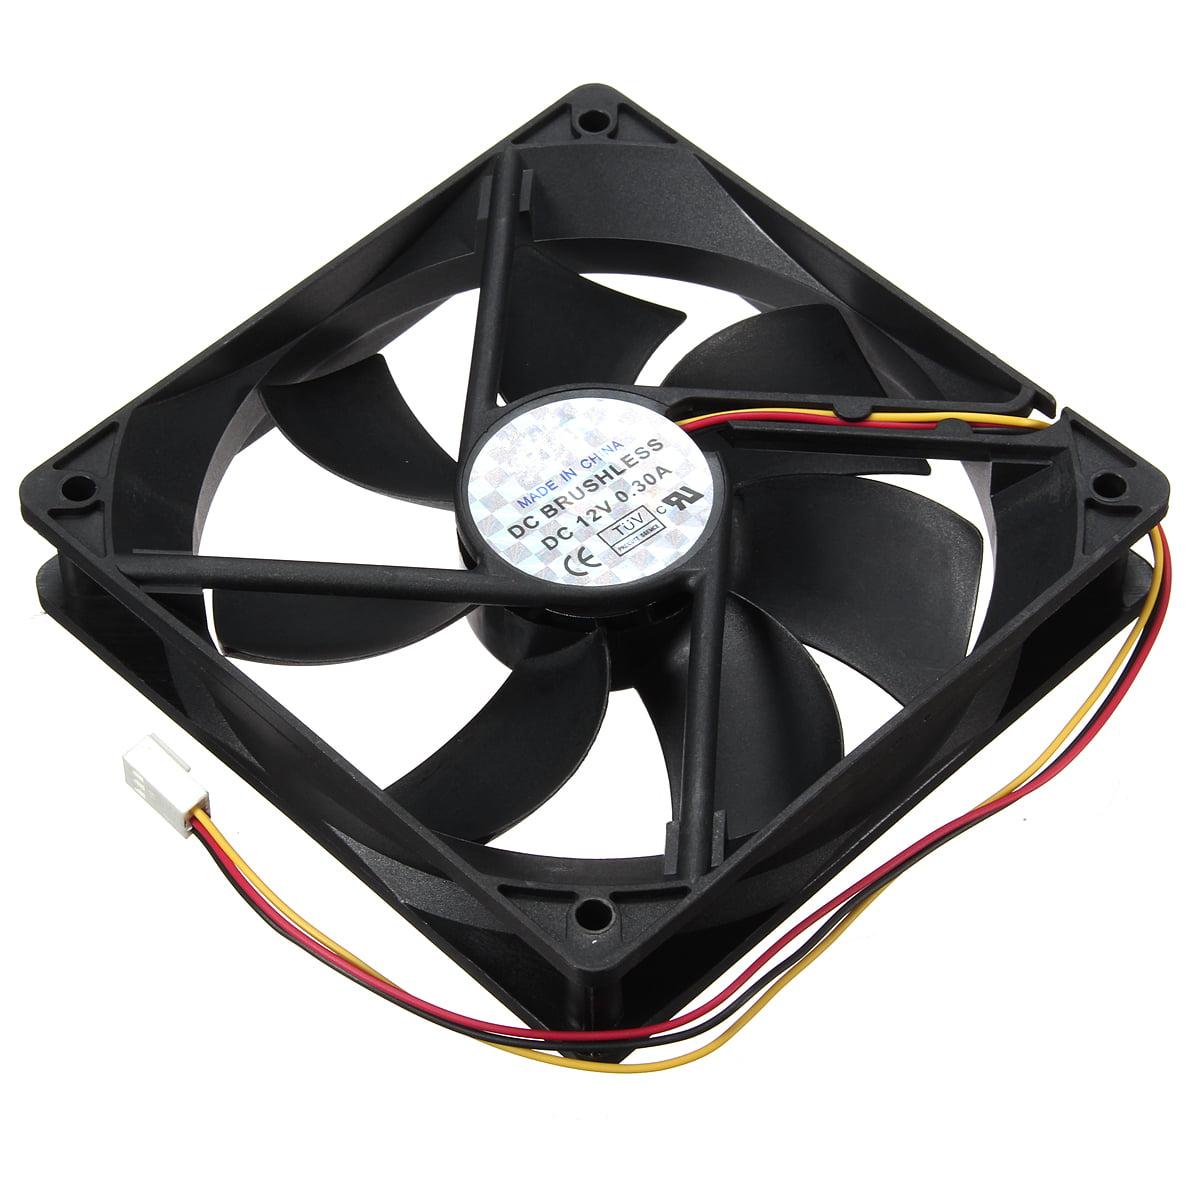 3 Pin 120mm 25mm Cooler Fan Heatsink Cooler Radiator For Computer PC CPU 12V USA